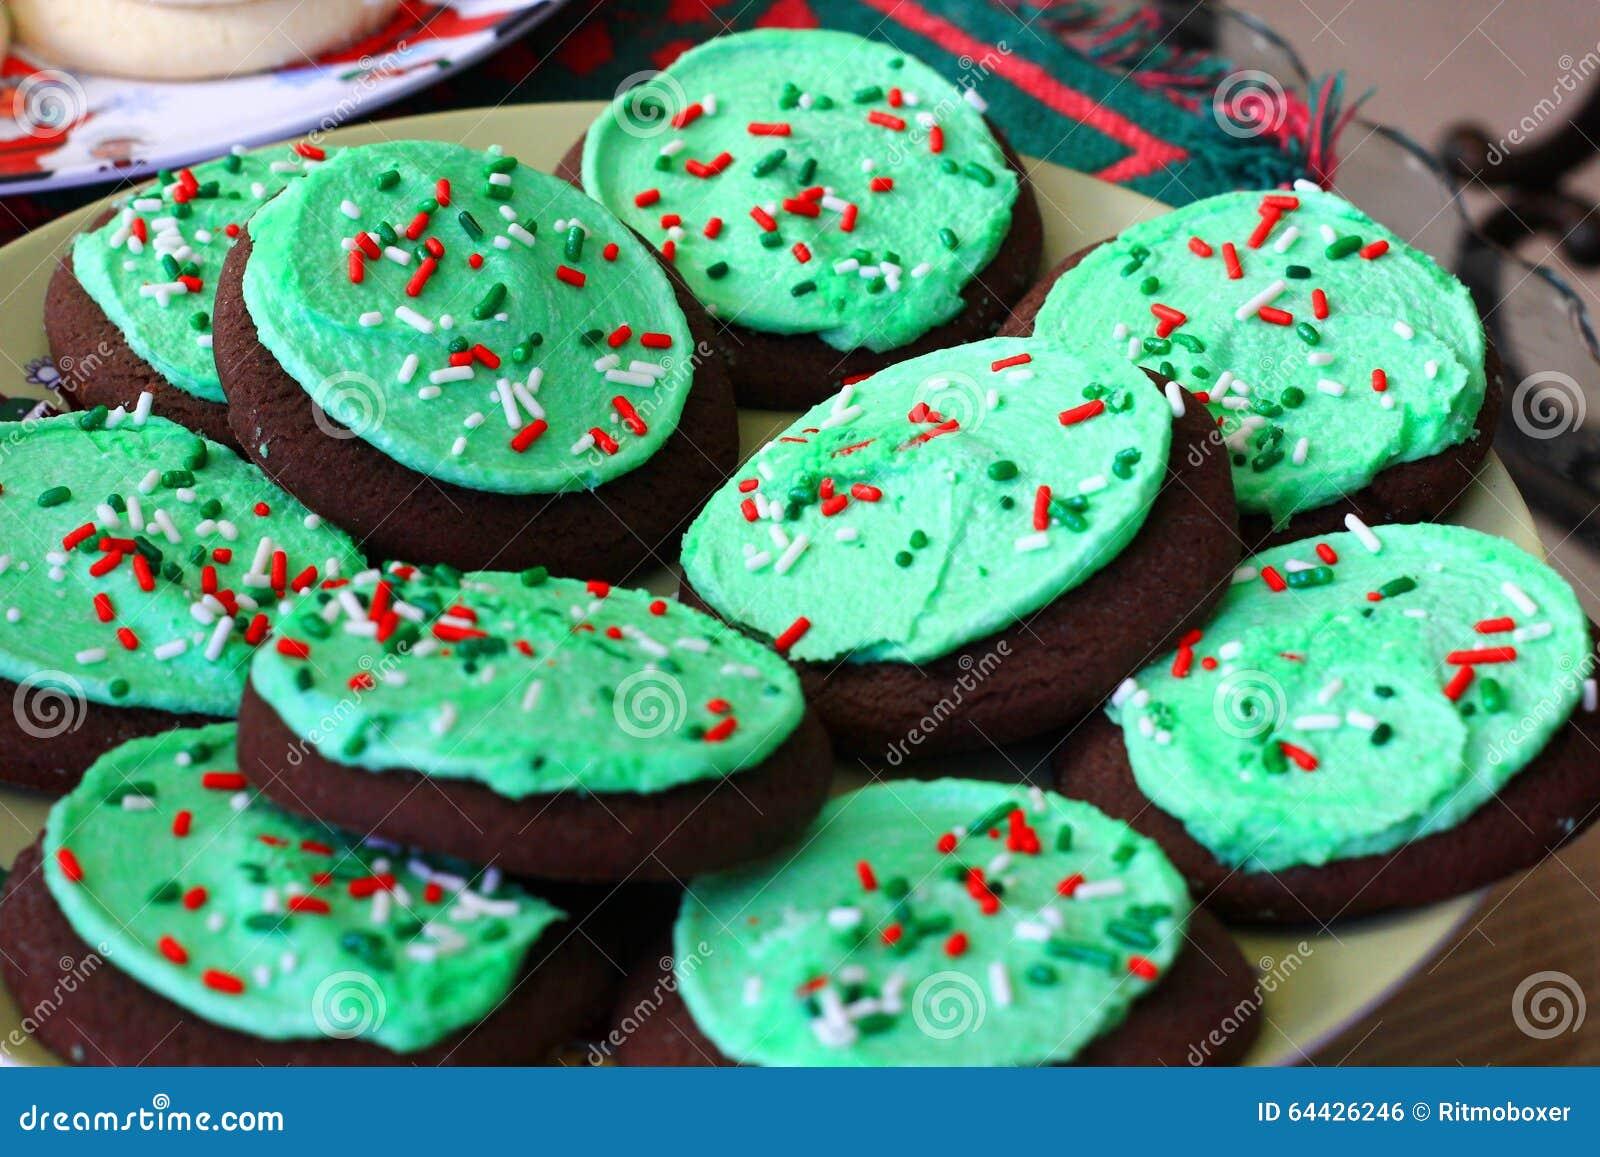 Green Chocolate Christmas Cookies Stock Photo - Image: 64426246